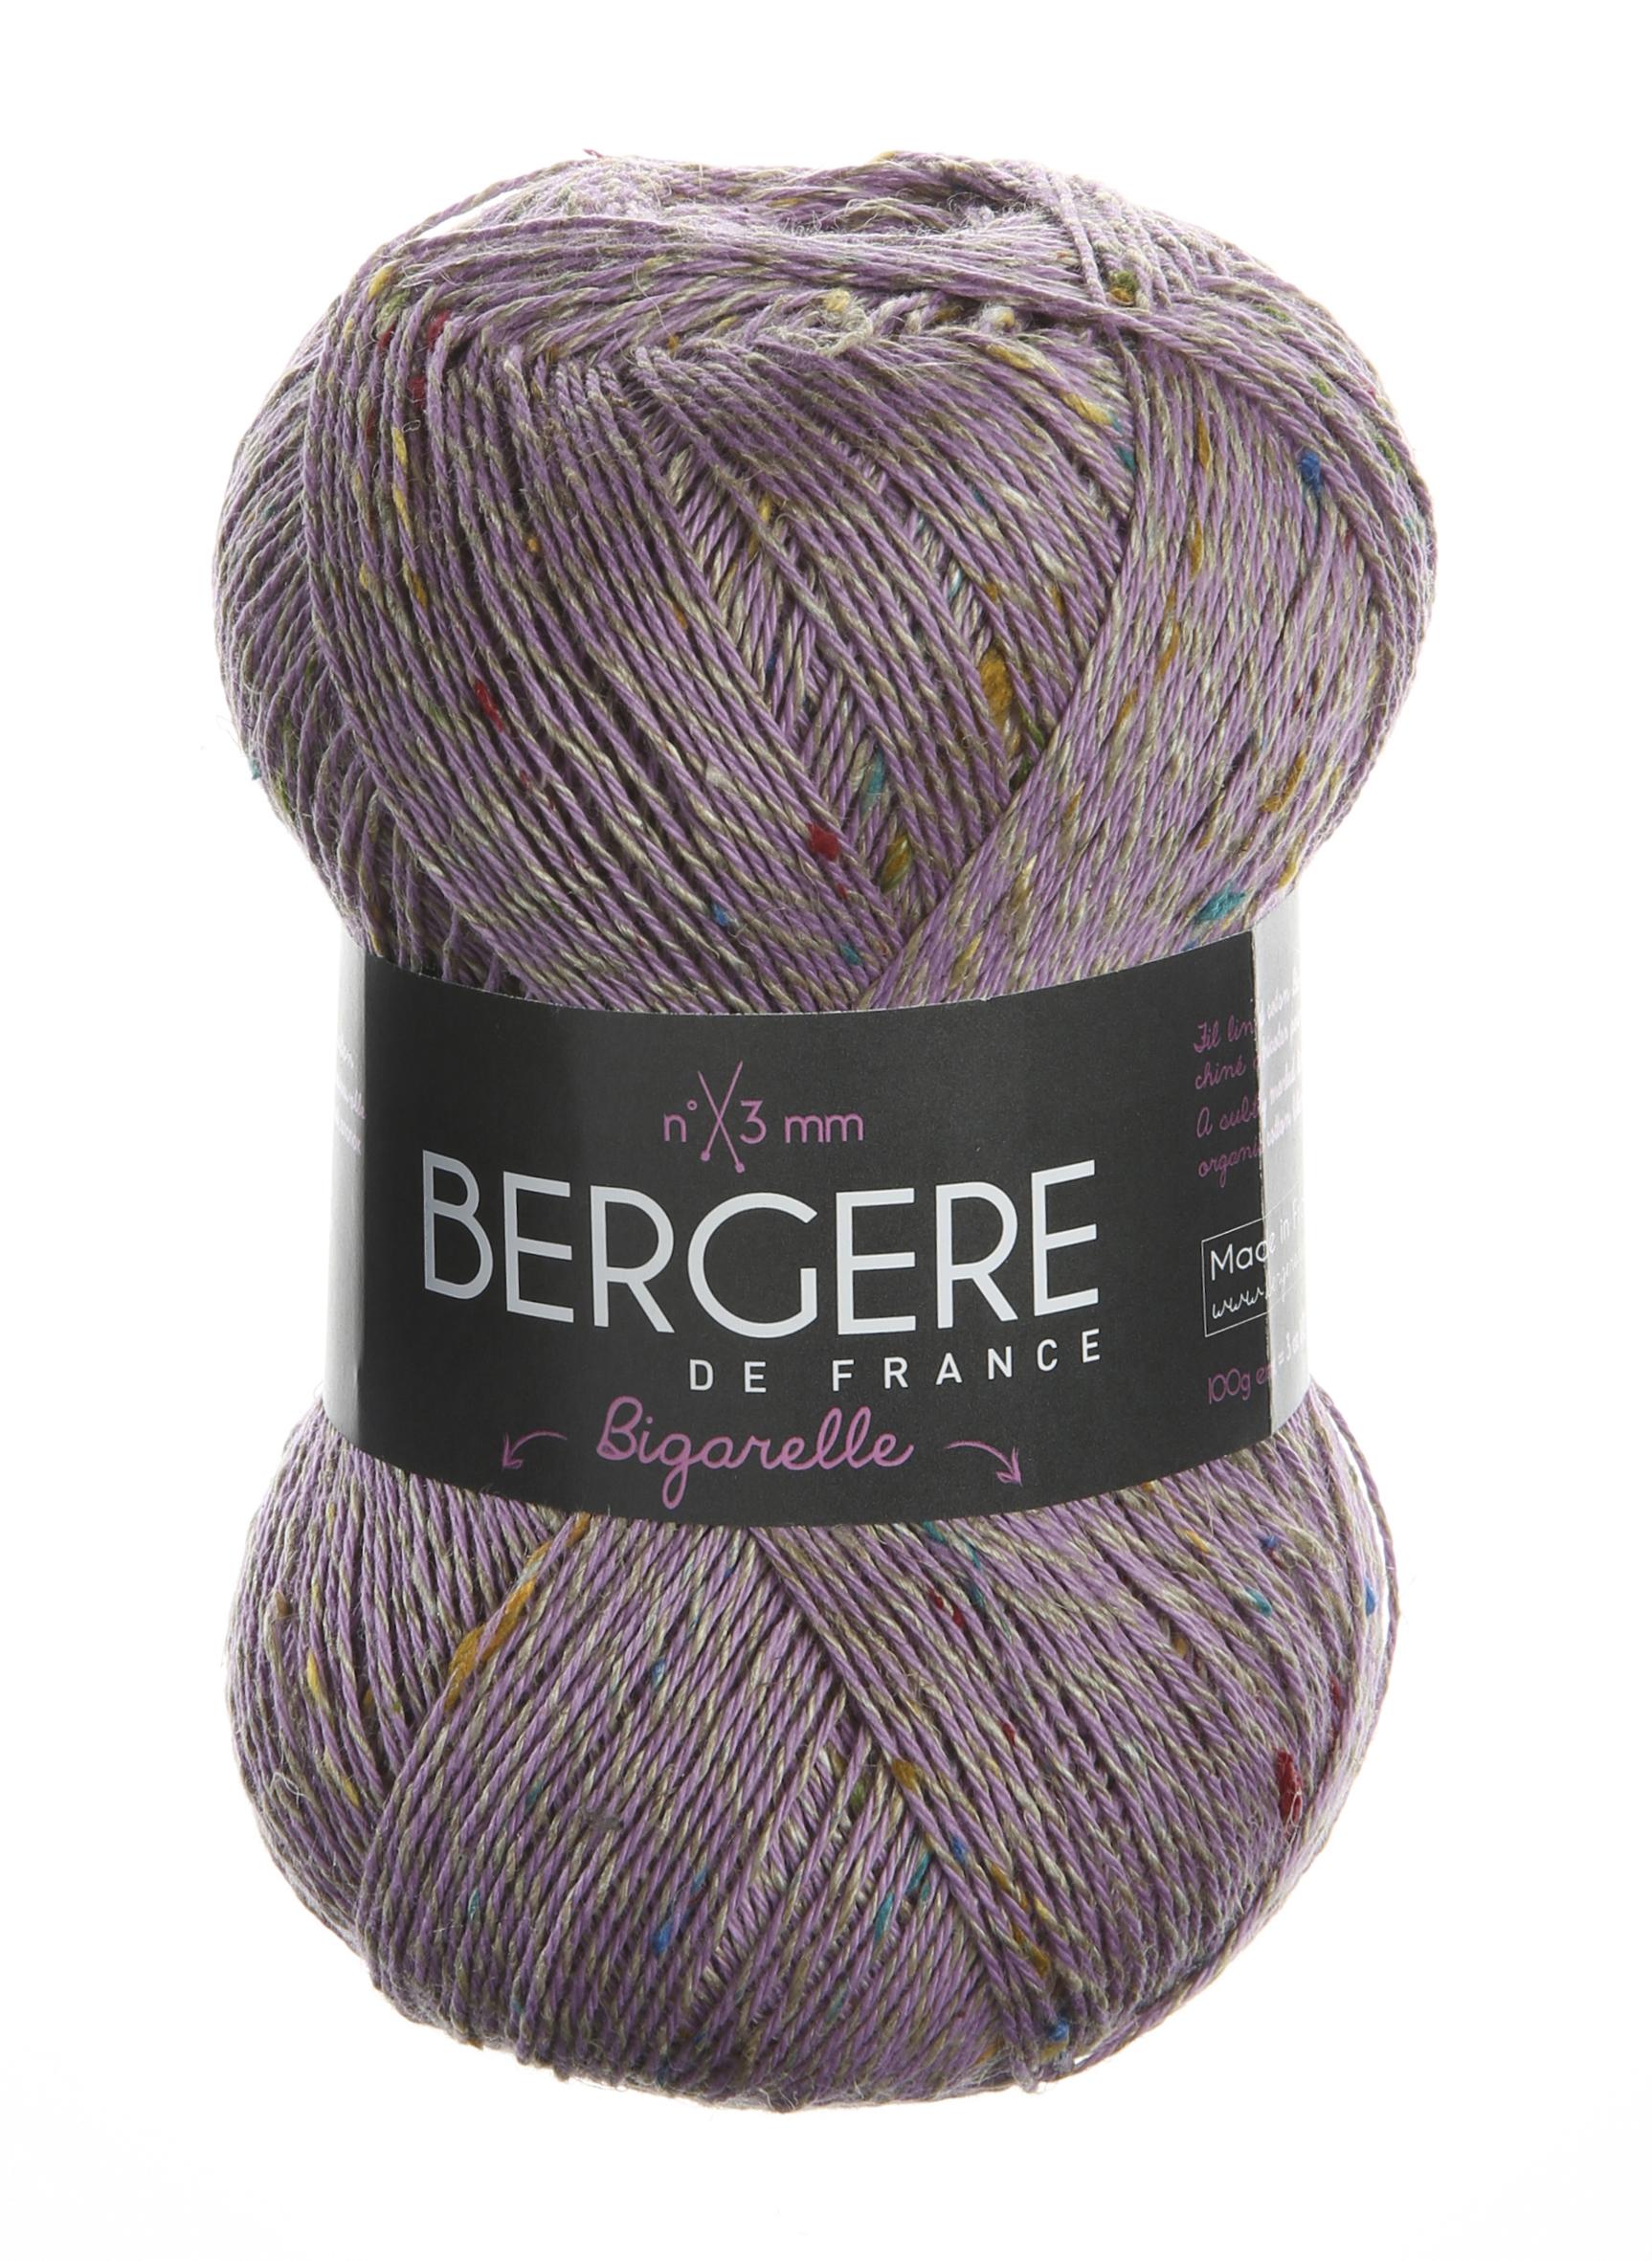 Bergere De France Magazine Creations Aw15 16: Пряжа BERGERE DE FRANCE BIGARELLE (55% органический хлопок